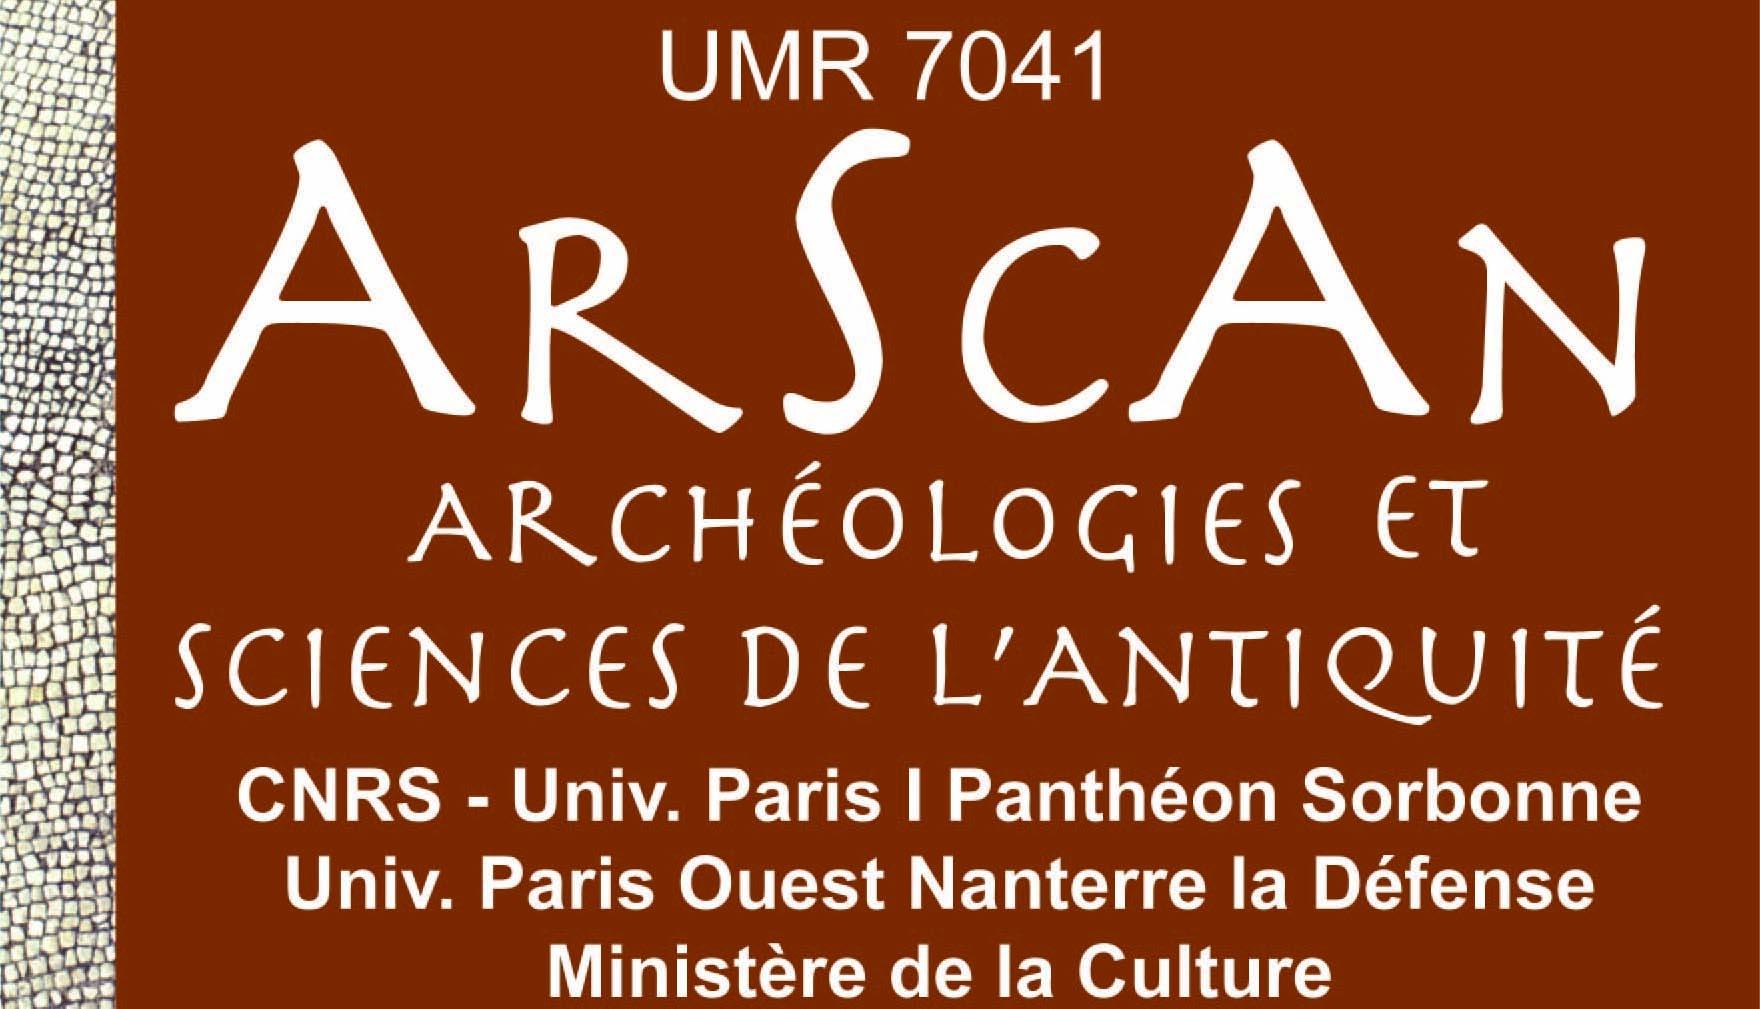 UMR 7041 ArscAn